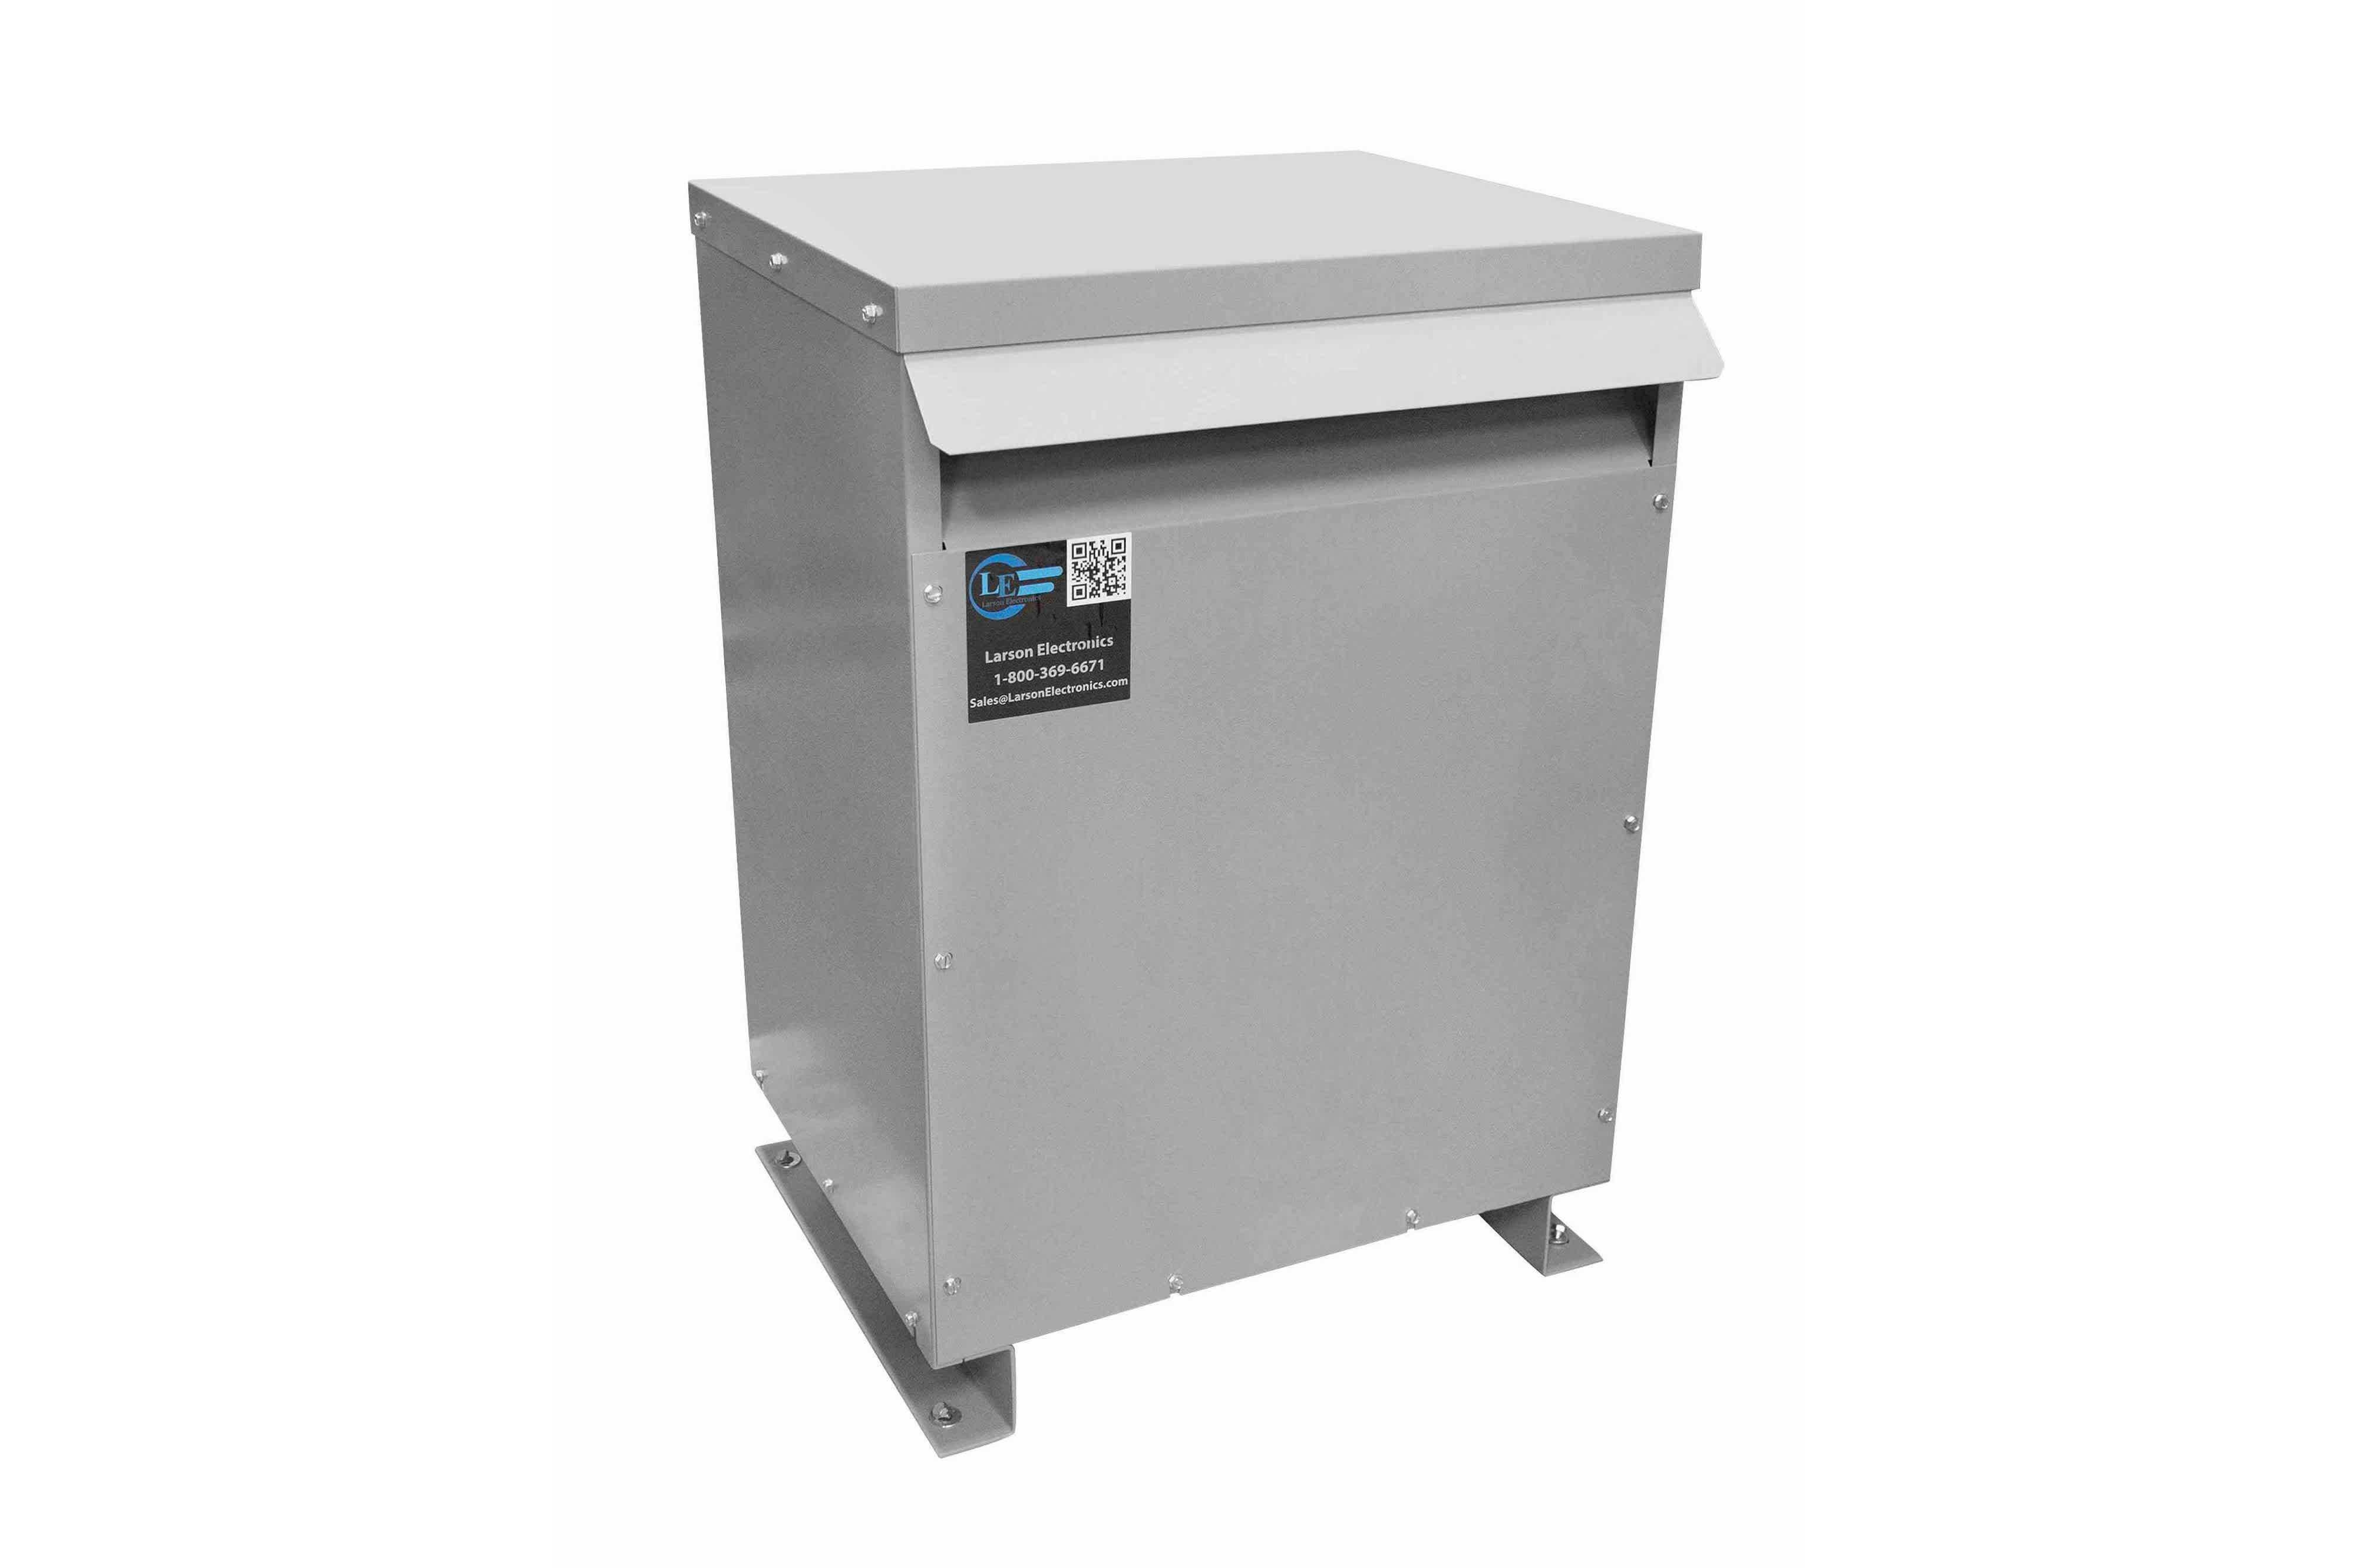 167 kVA 3PH Isolation Transformer, 220V Wye Primary, 480Y/277 Wye-N Secondary, N3R, Ventilated, 60 Hz